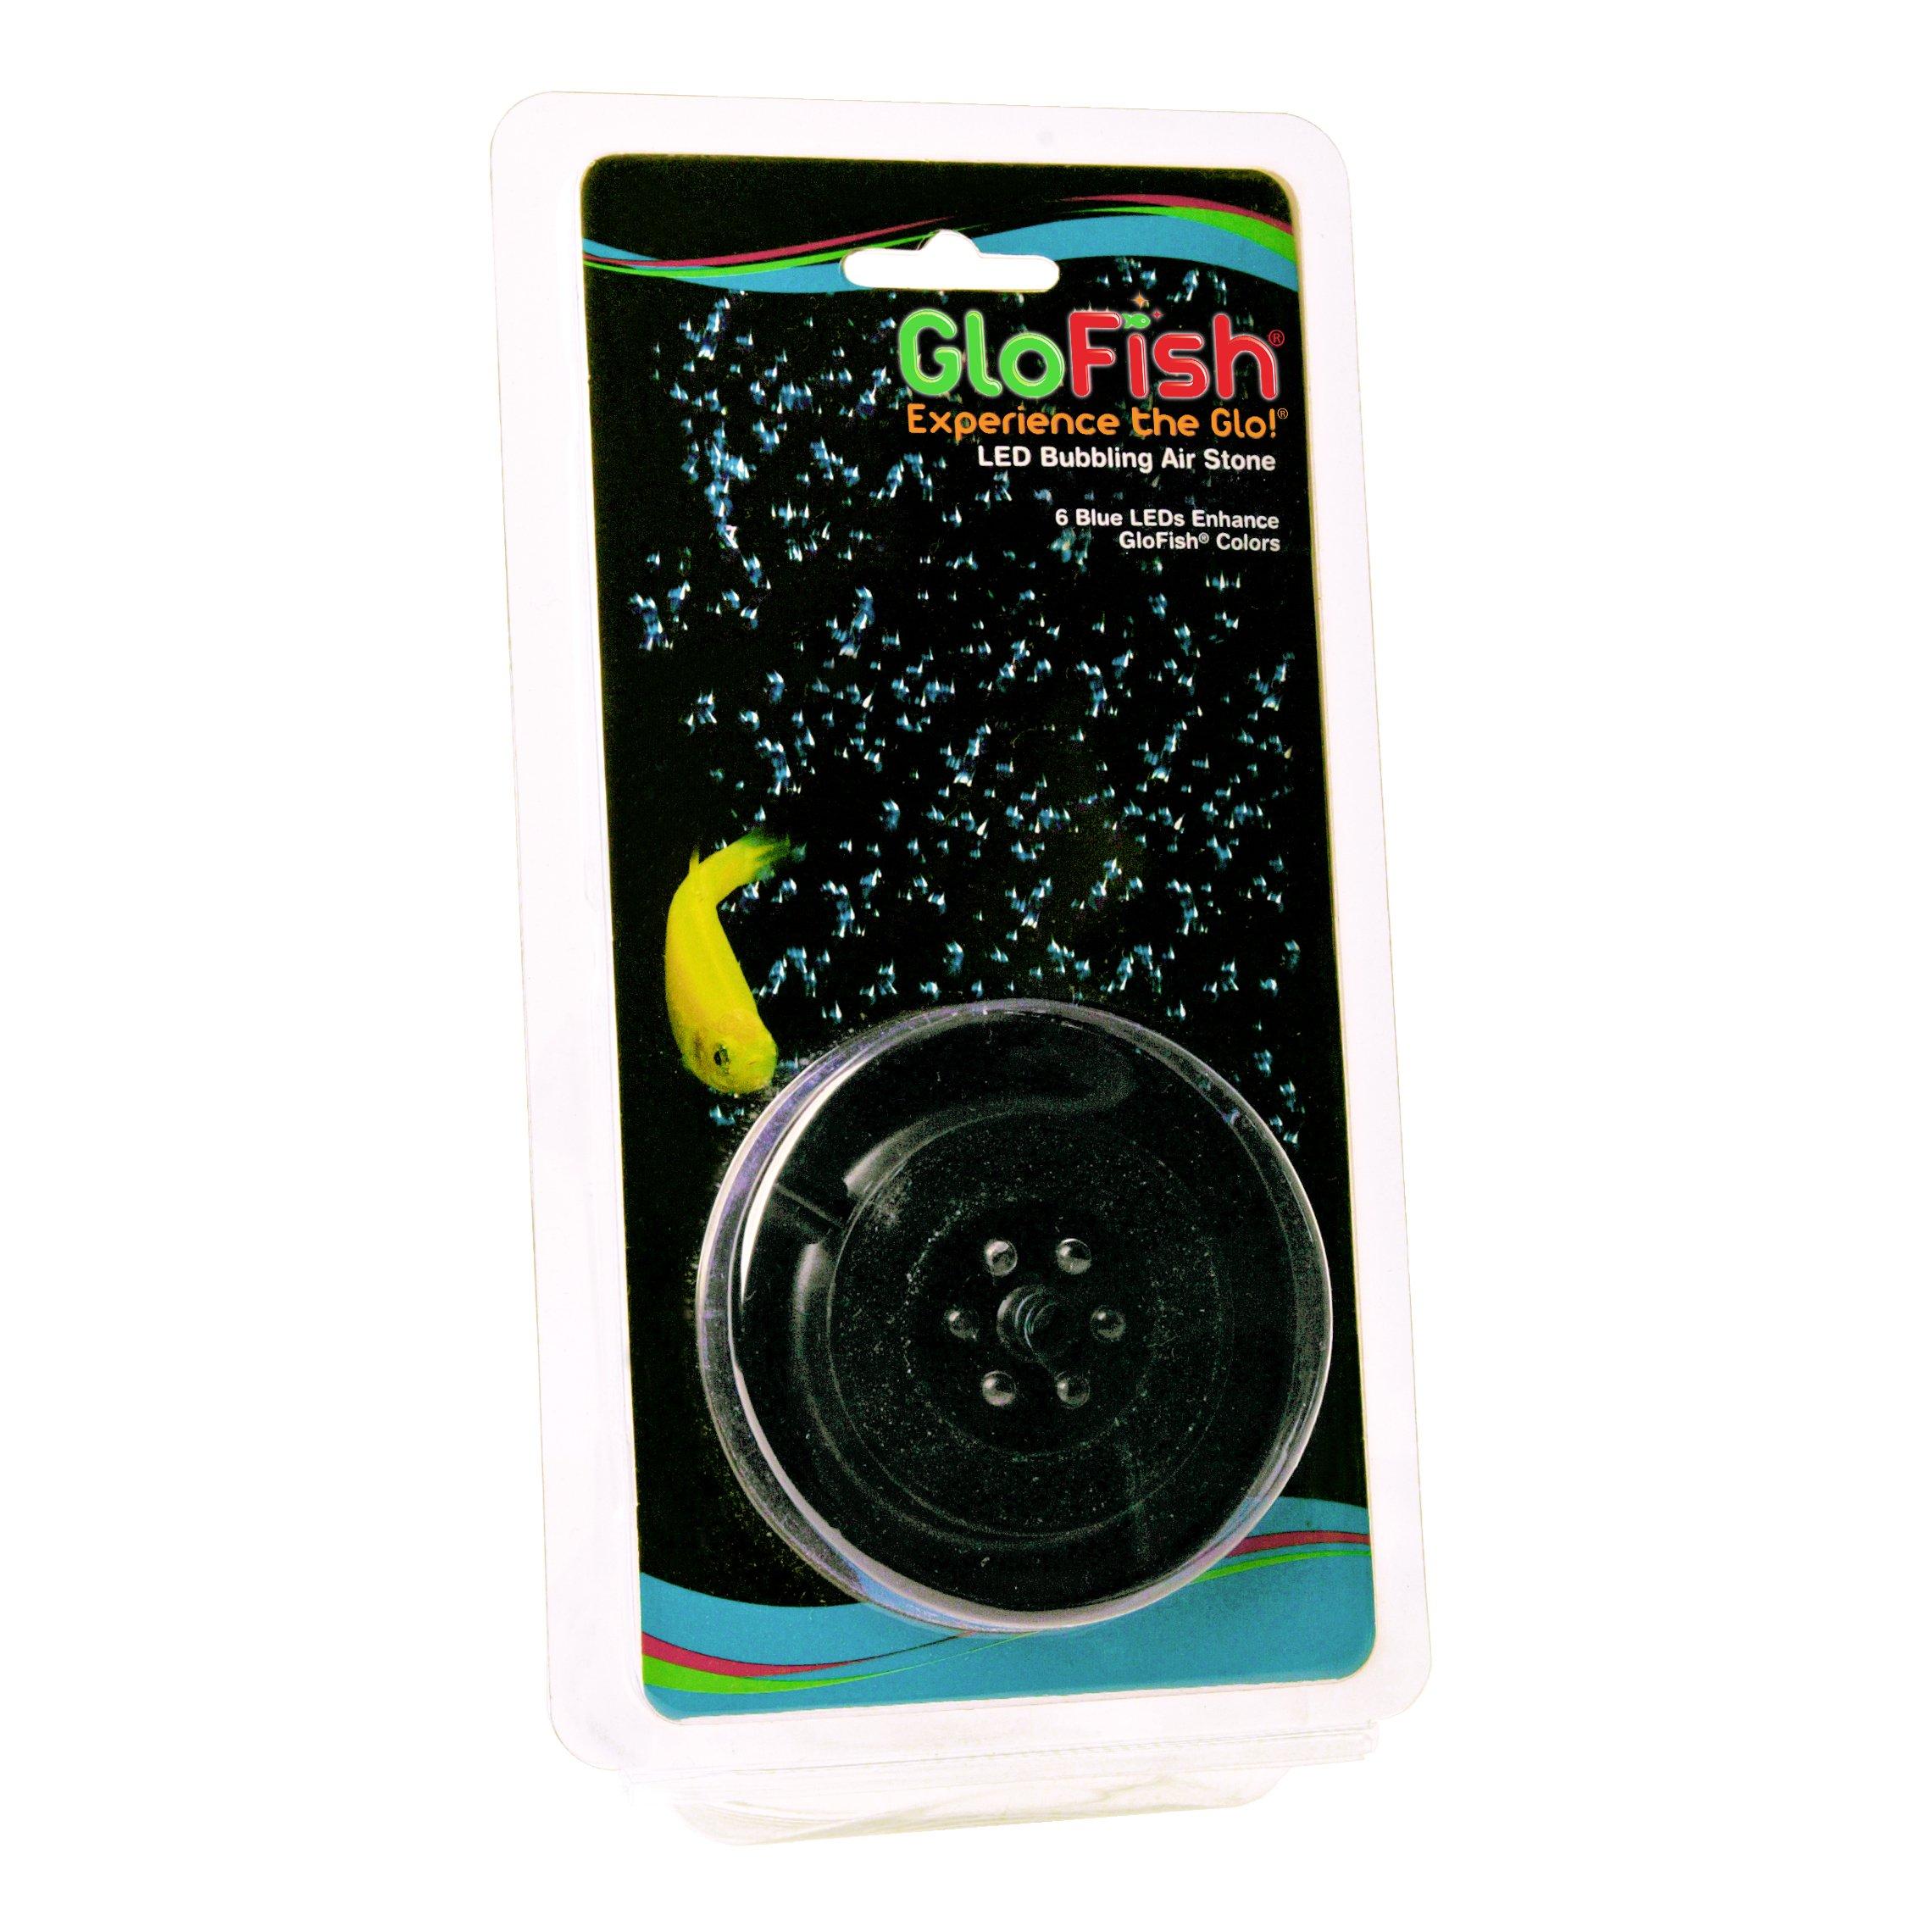 GloFish Round Aquarium LED Bubbling Air Stone, 6 Blue LEDs